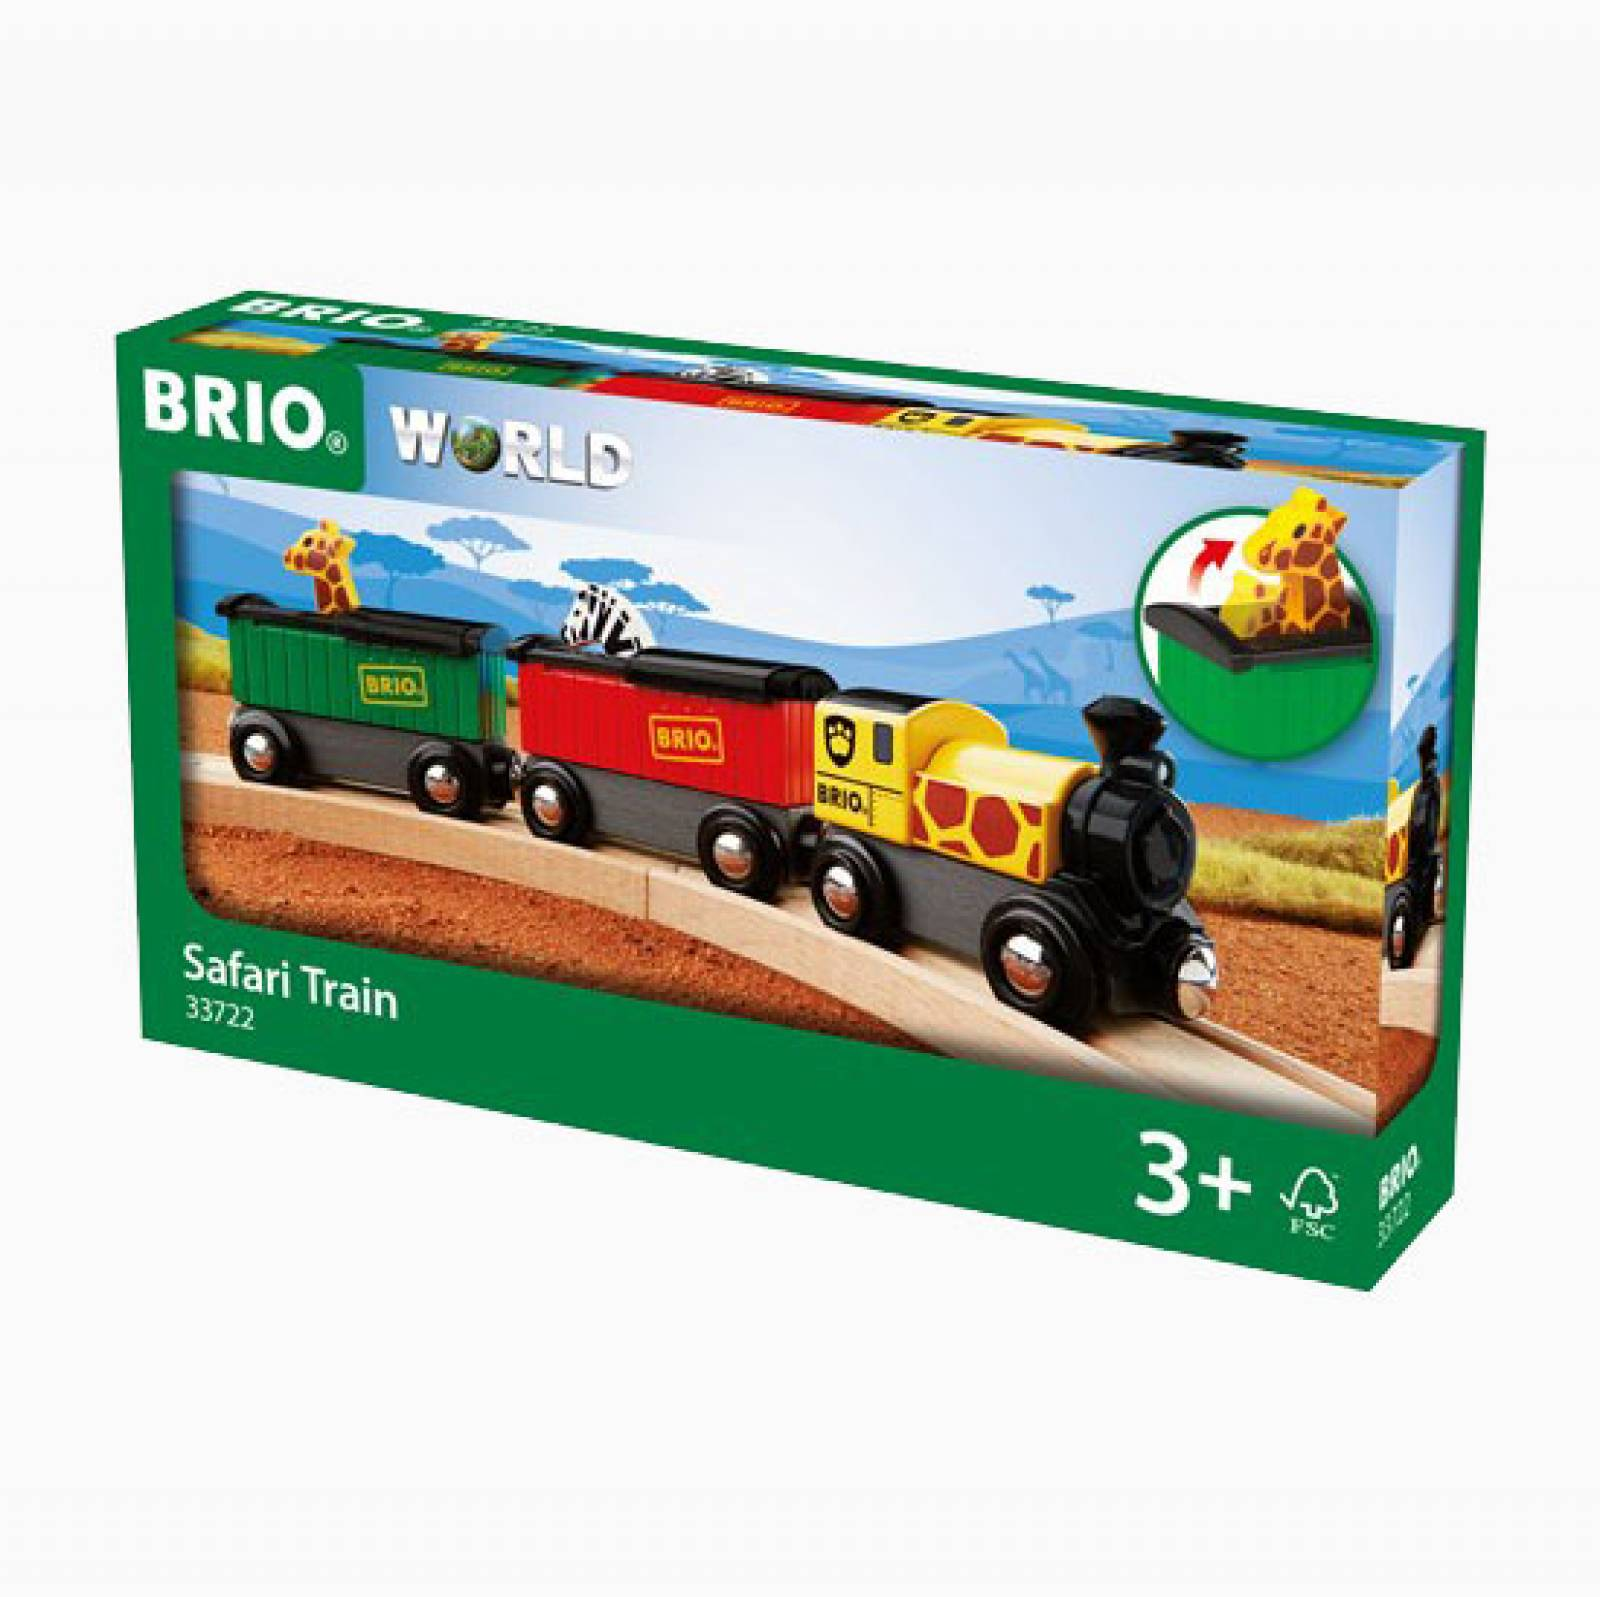 Safari Train BRIO Wooden Railway Age 3+ thumbnails